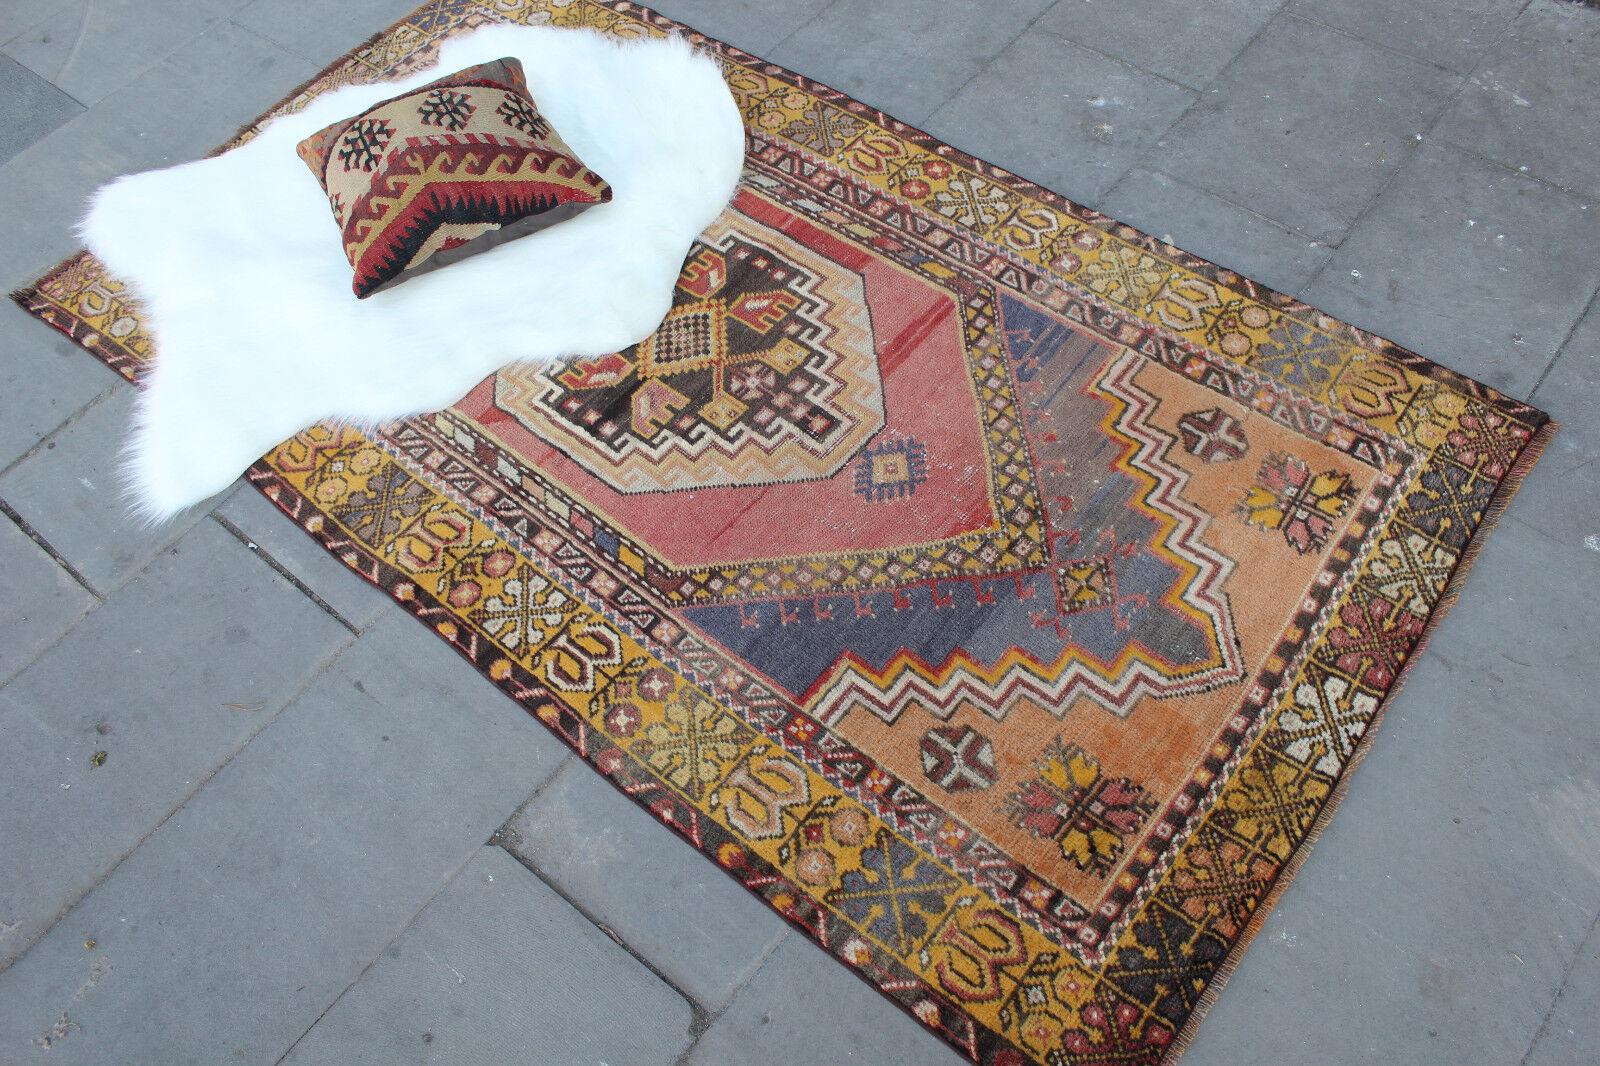 Vintage Handmade Turkish Oushak Wool Anatolia rosso Area Rug 185x100cm,74 x40